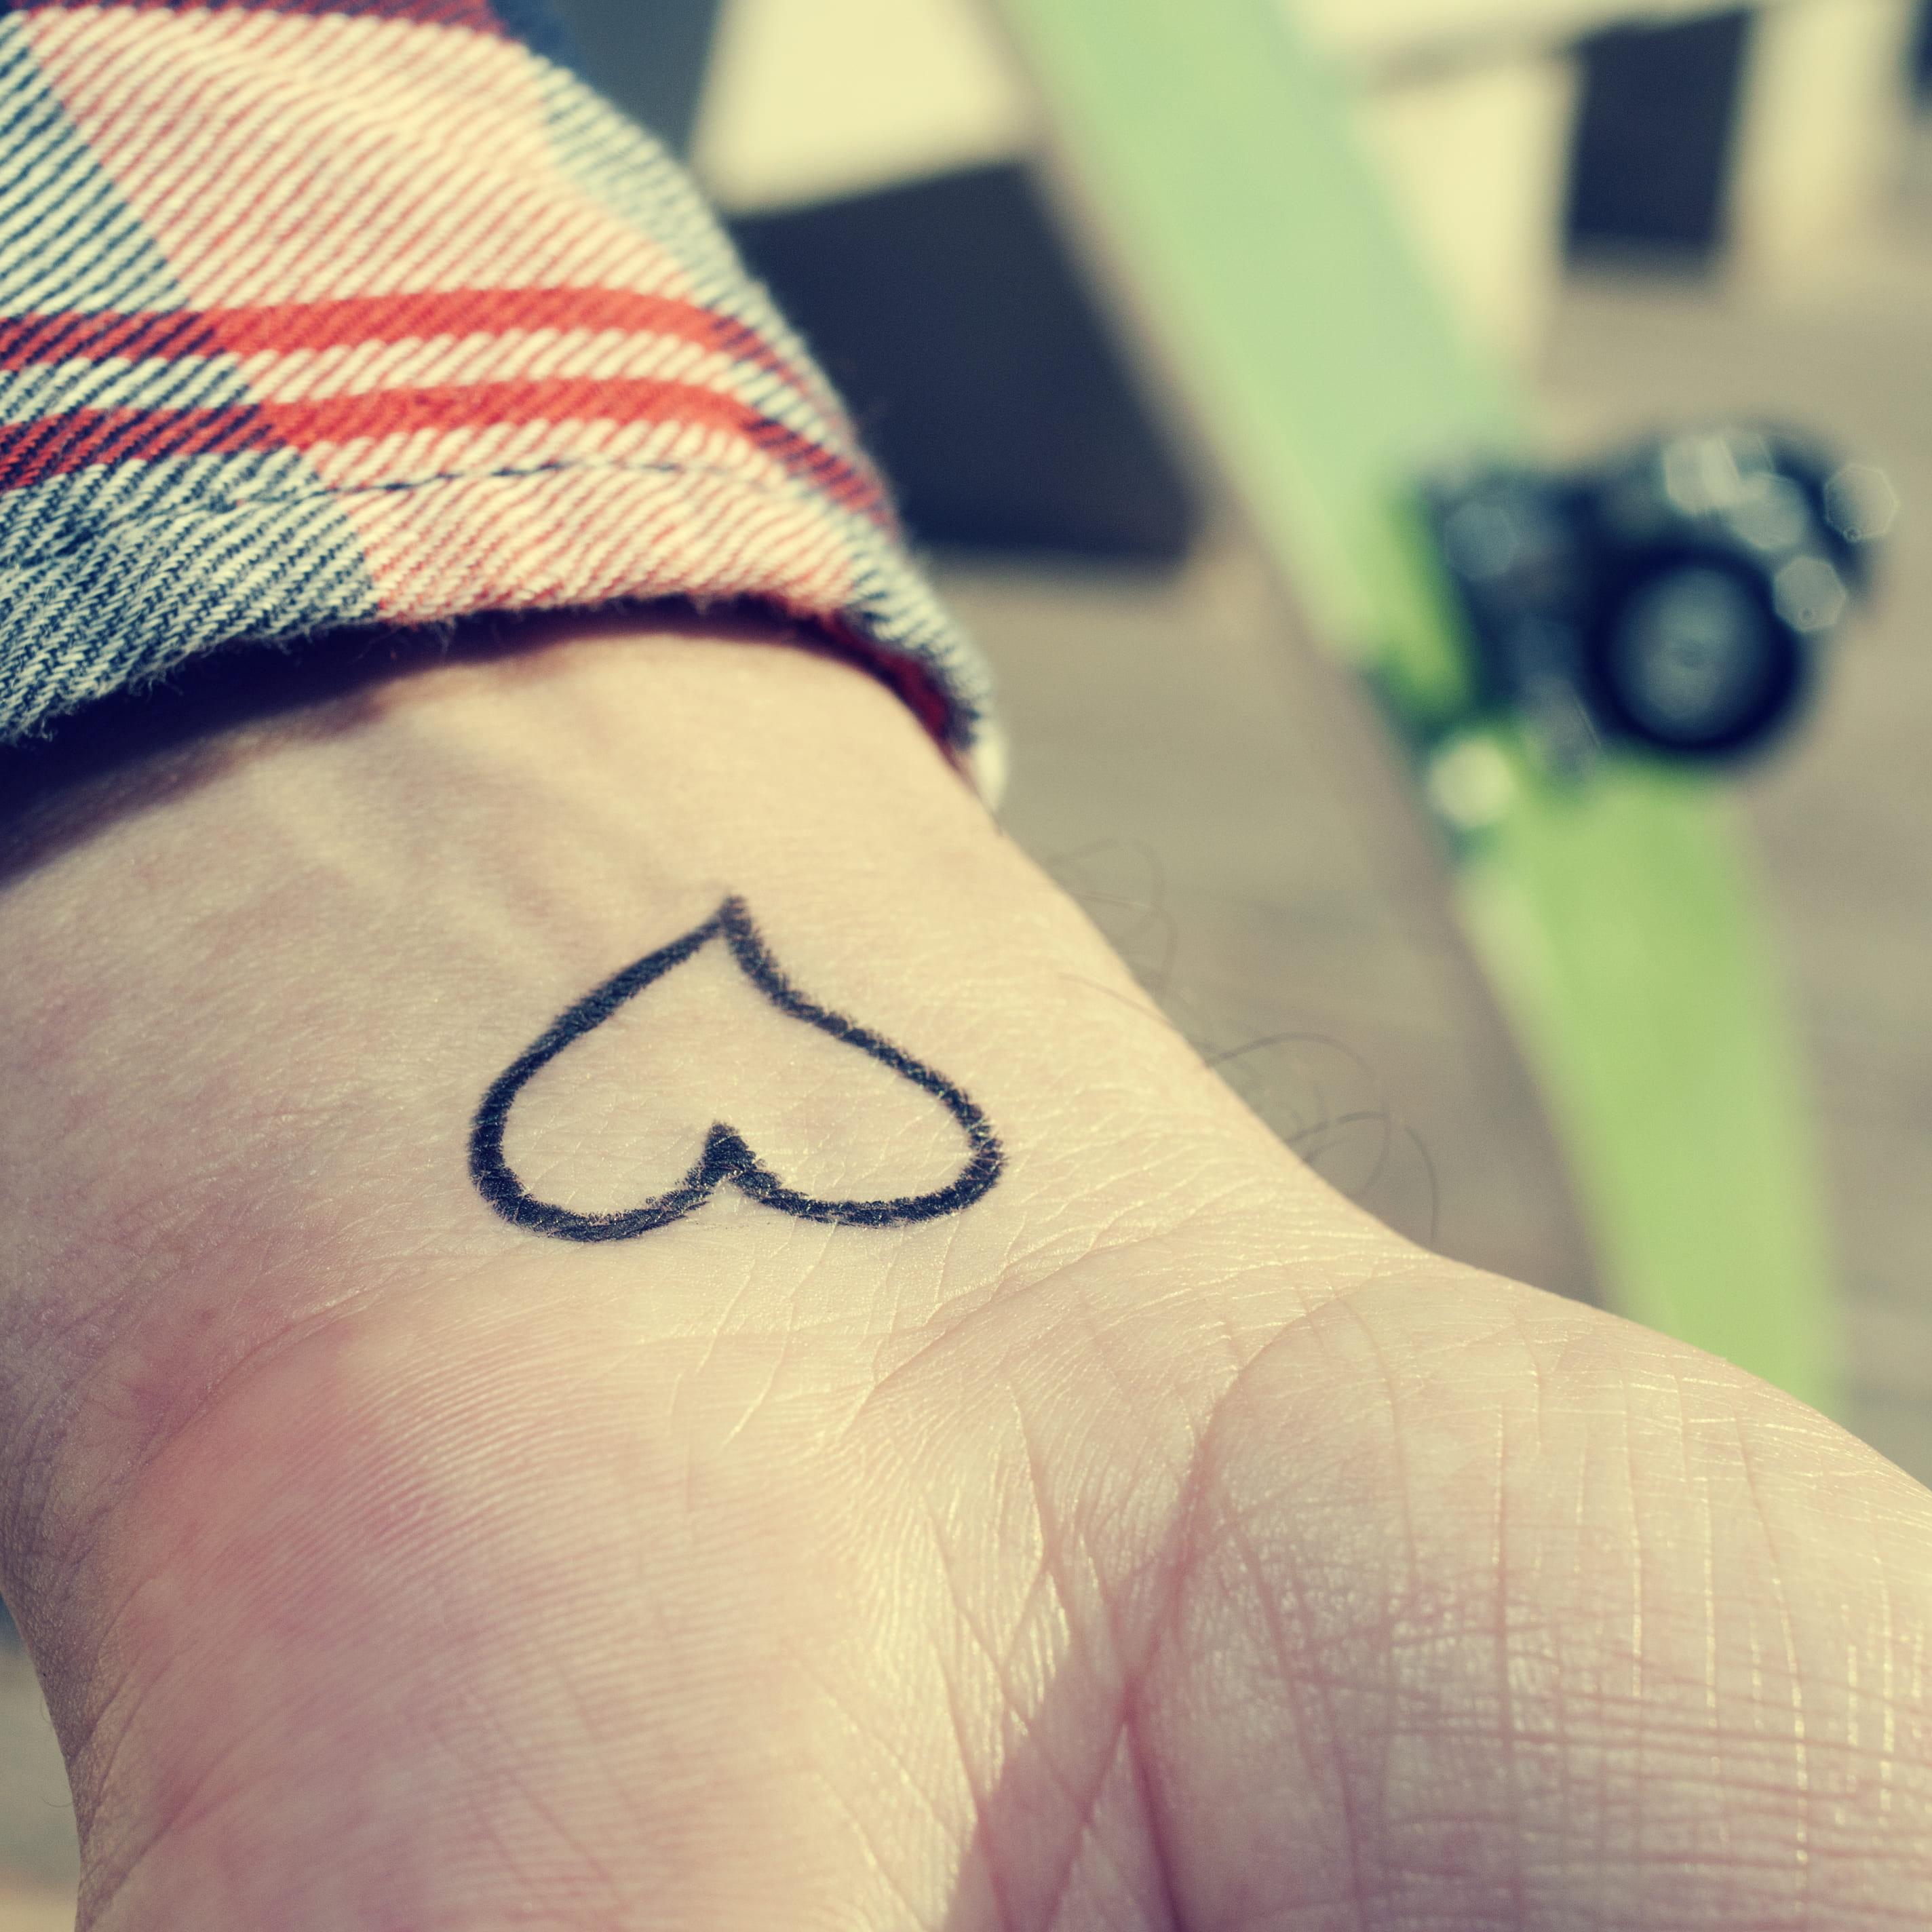 Tattoo Design Ideas for Girls - 12